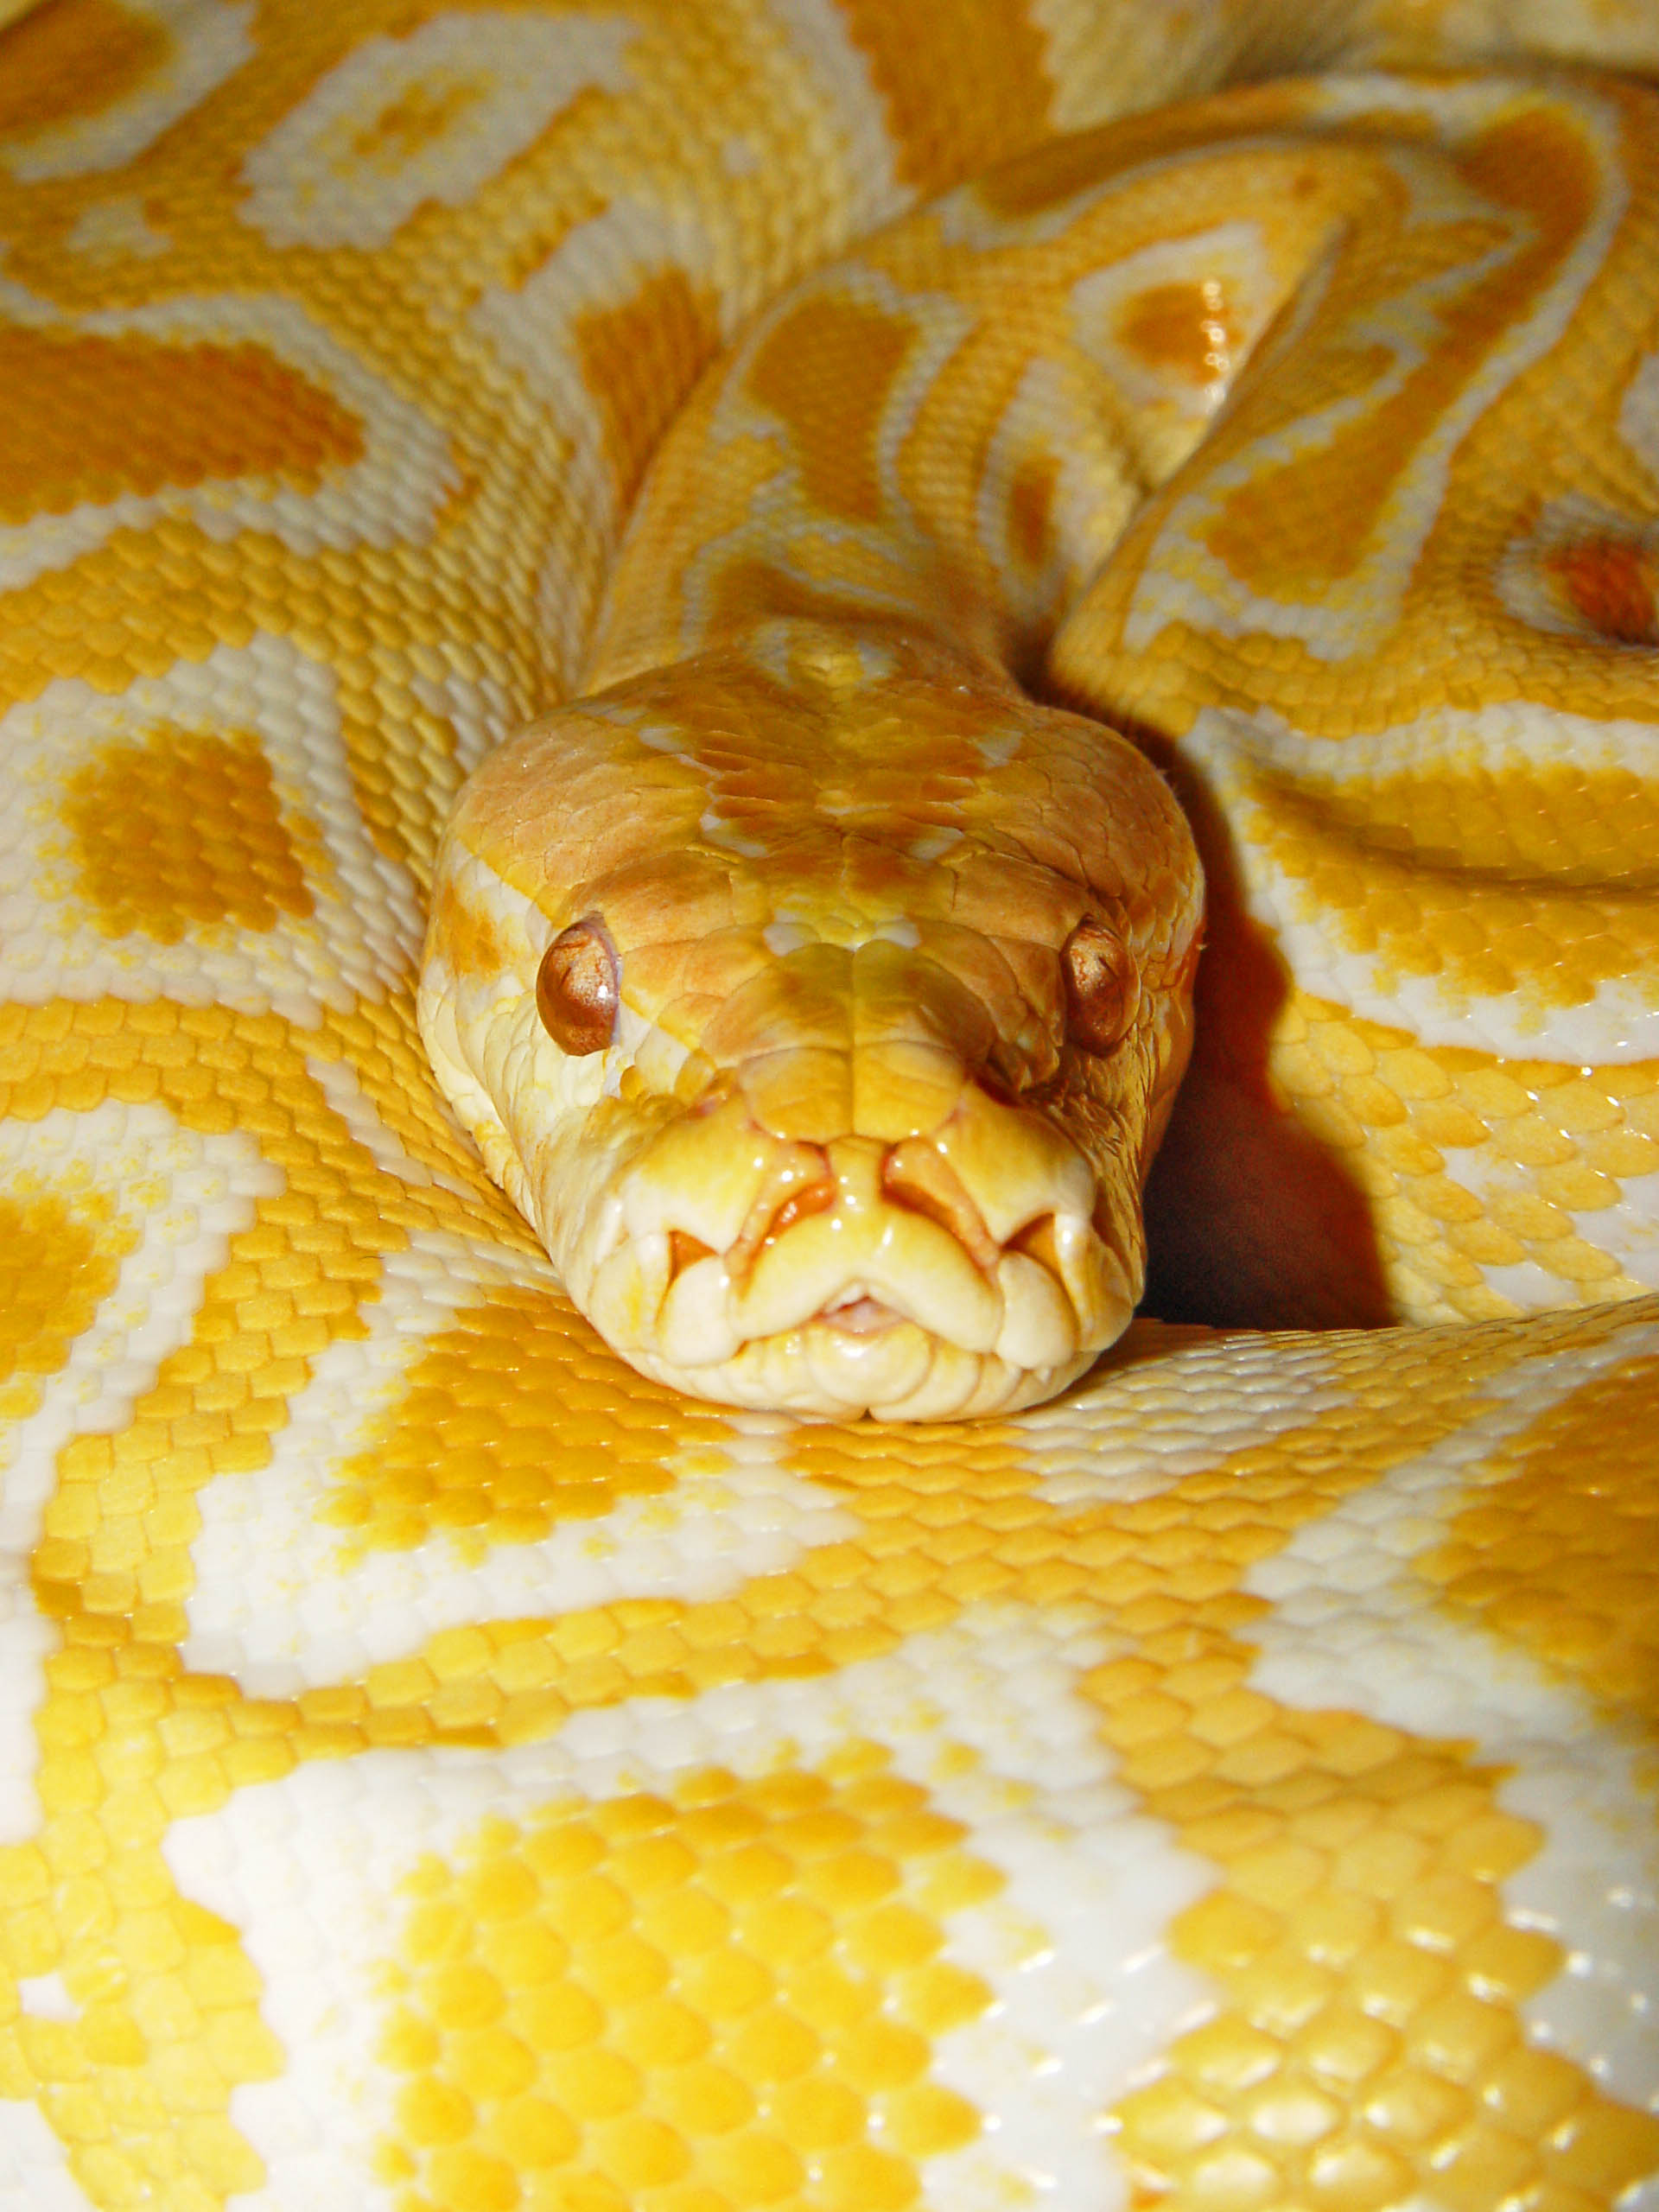 Приготовить змею в домашних условиях